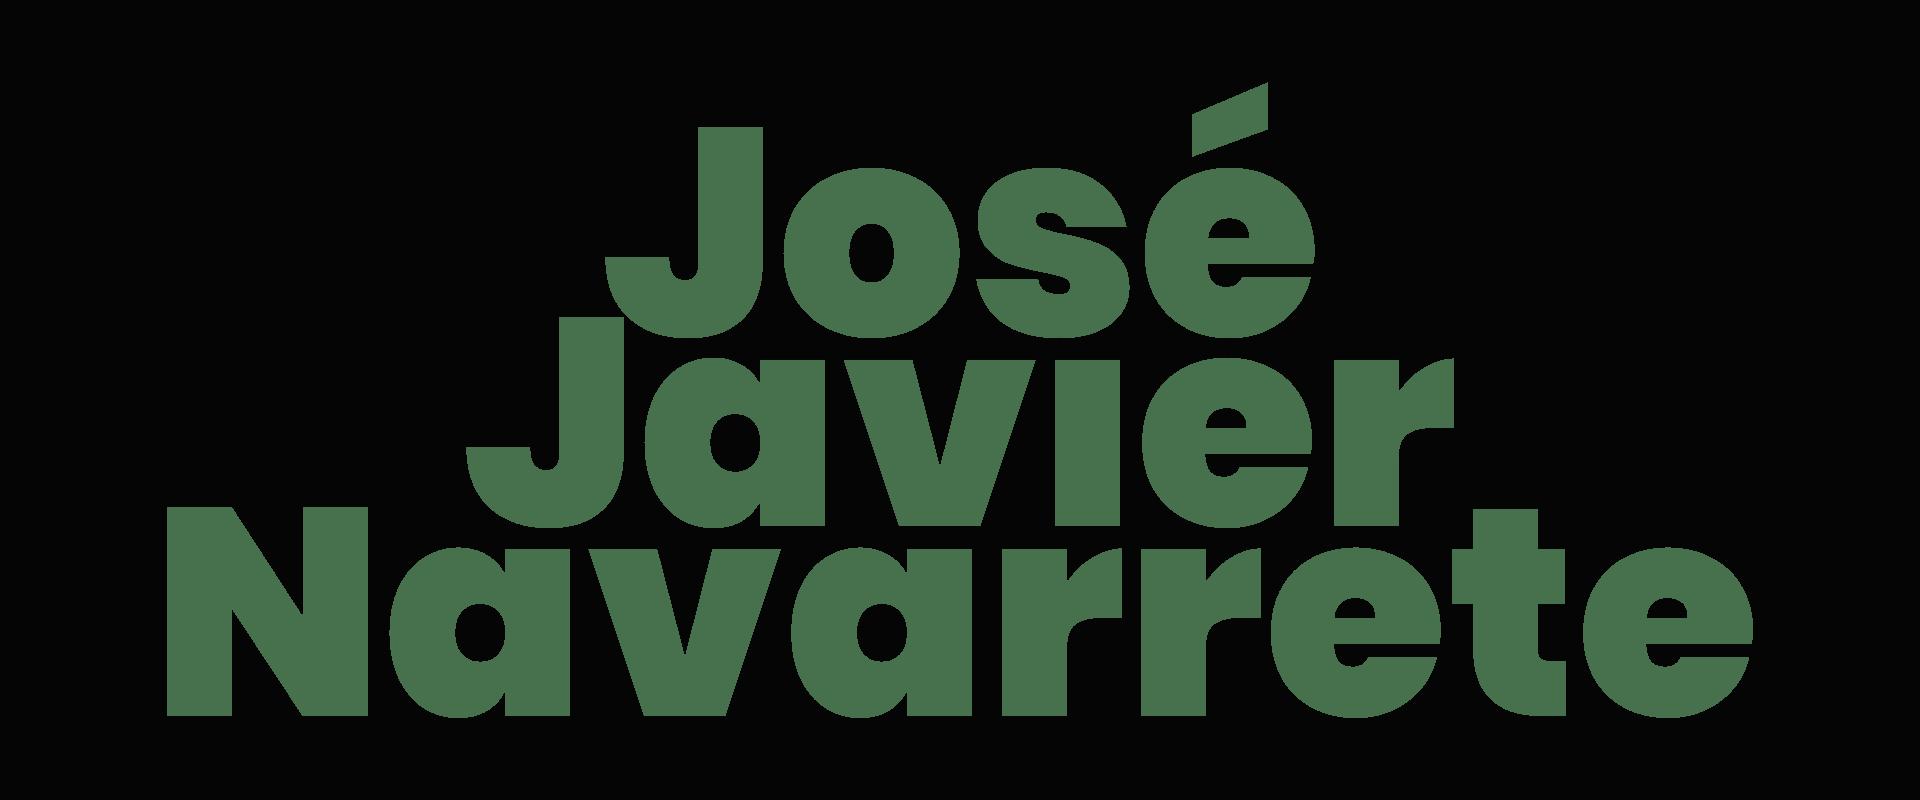 Rótulo de José Javier Navarrete